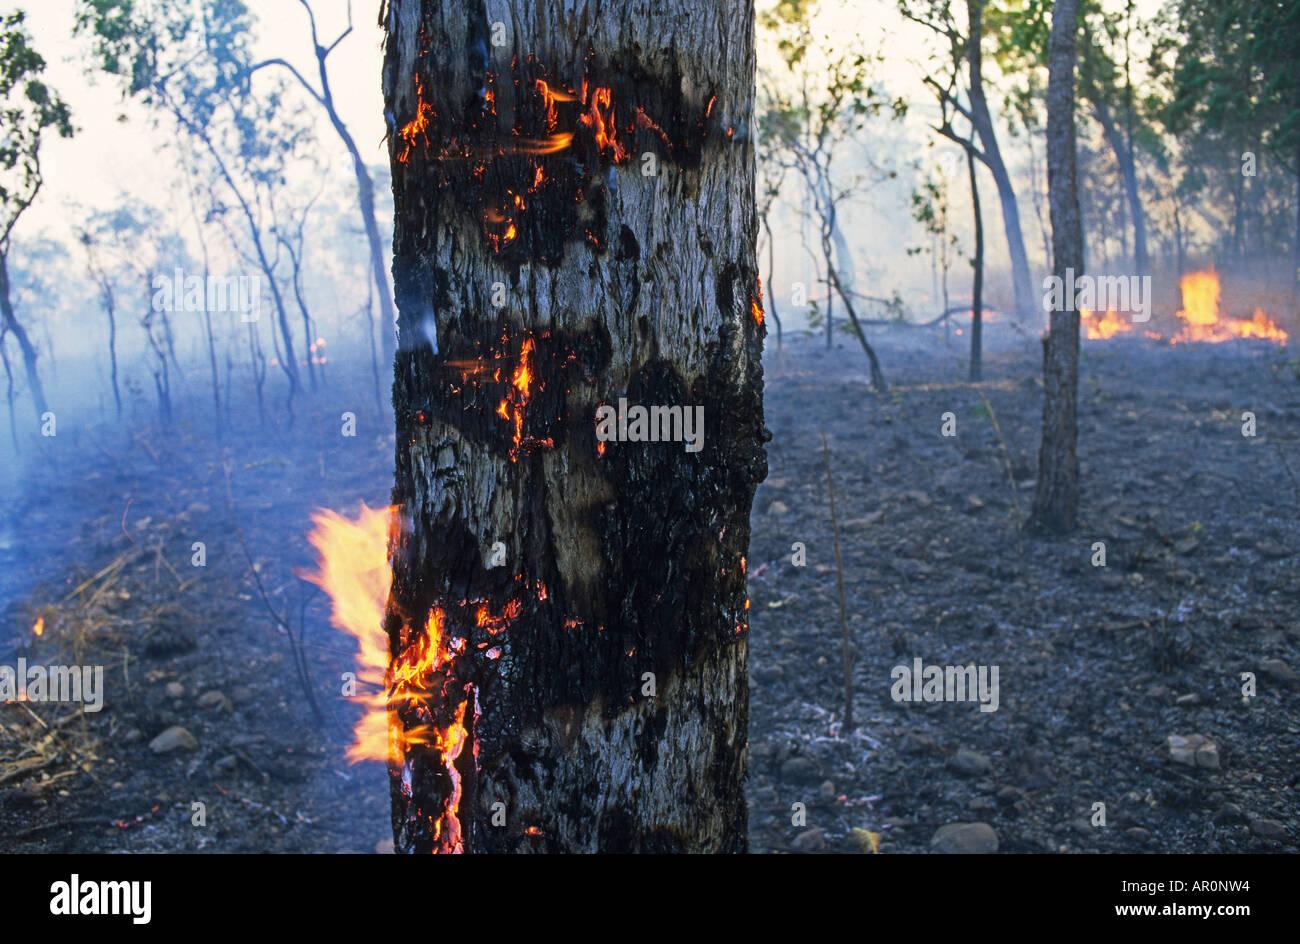 Bushfire, Litchfield NP, Australien, Summer Bushfire in Litchfield National Park, after dry period, Waldbrand im Sommer in outba - Stock Image